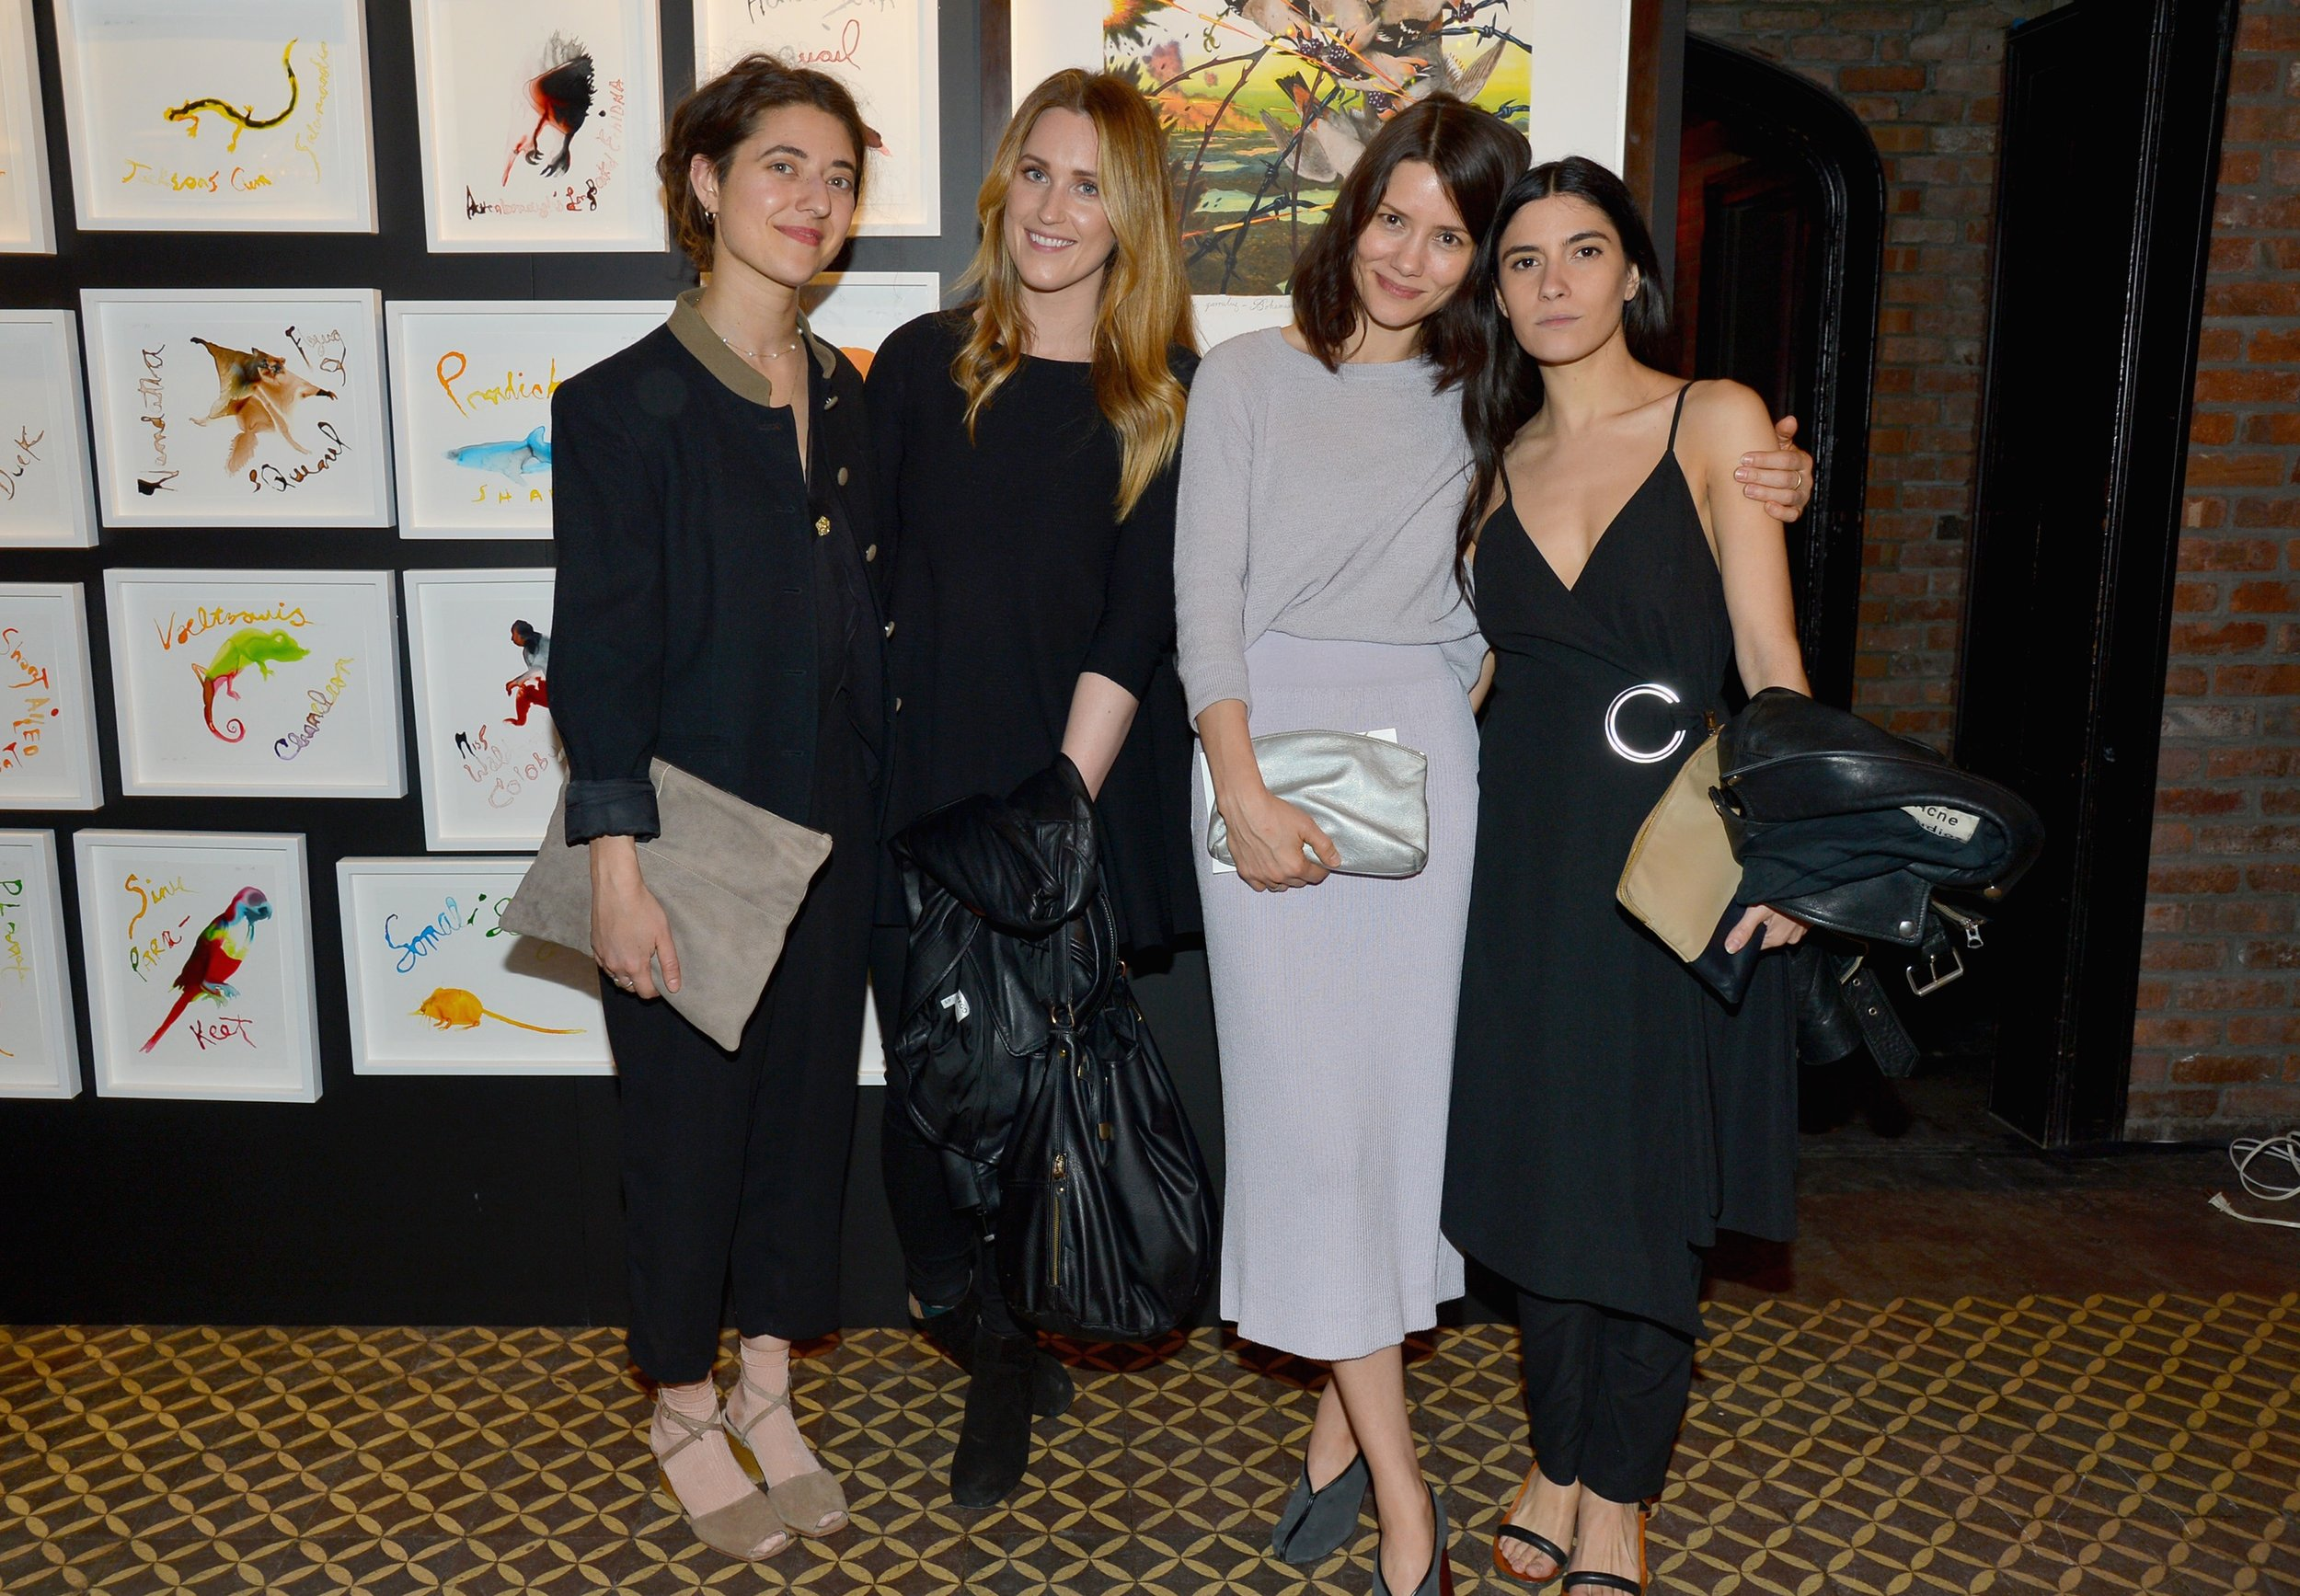 Alyssa Benjamin, Veronica Overgard, Autumn Hruby, and Miranda Levitt